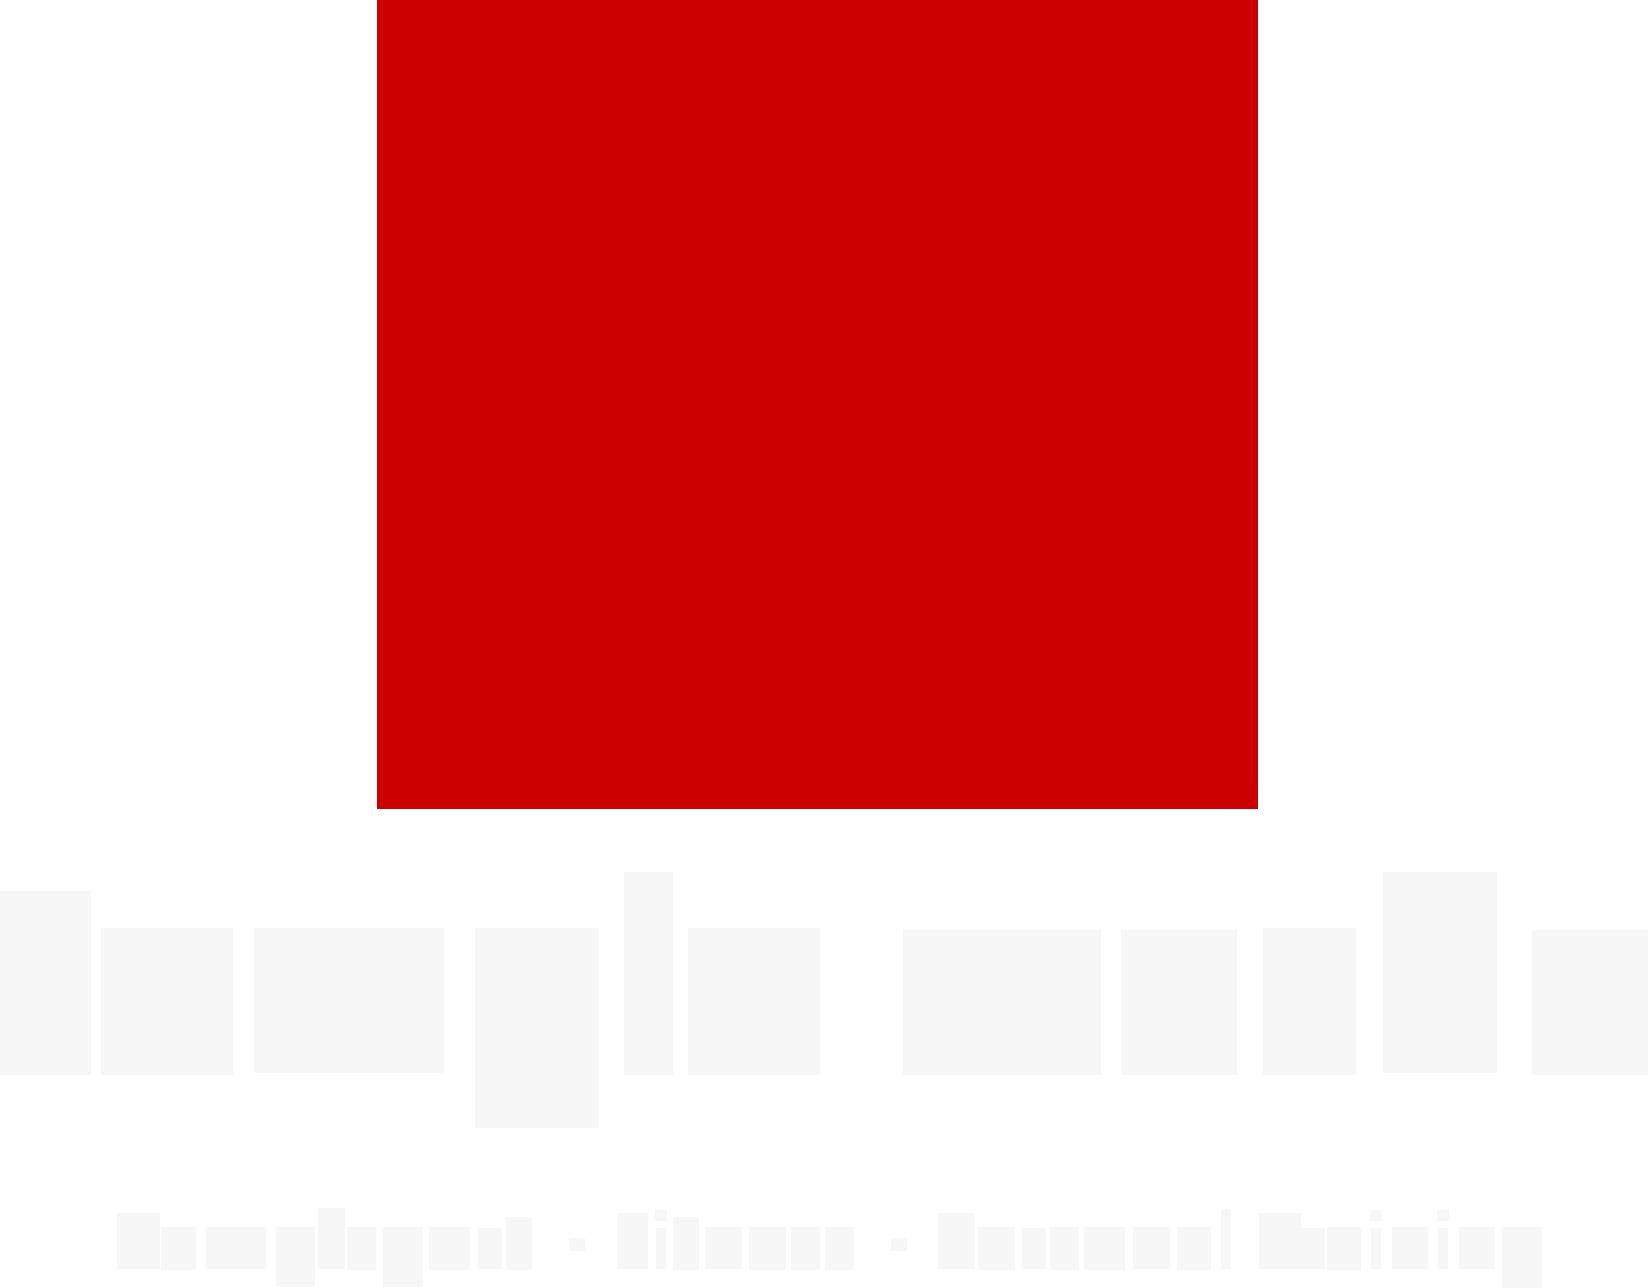 TW LOGO Schwarz Kampfsport Fitness Personal Training ohne weiß Kopie 3